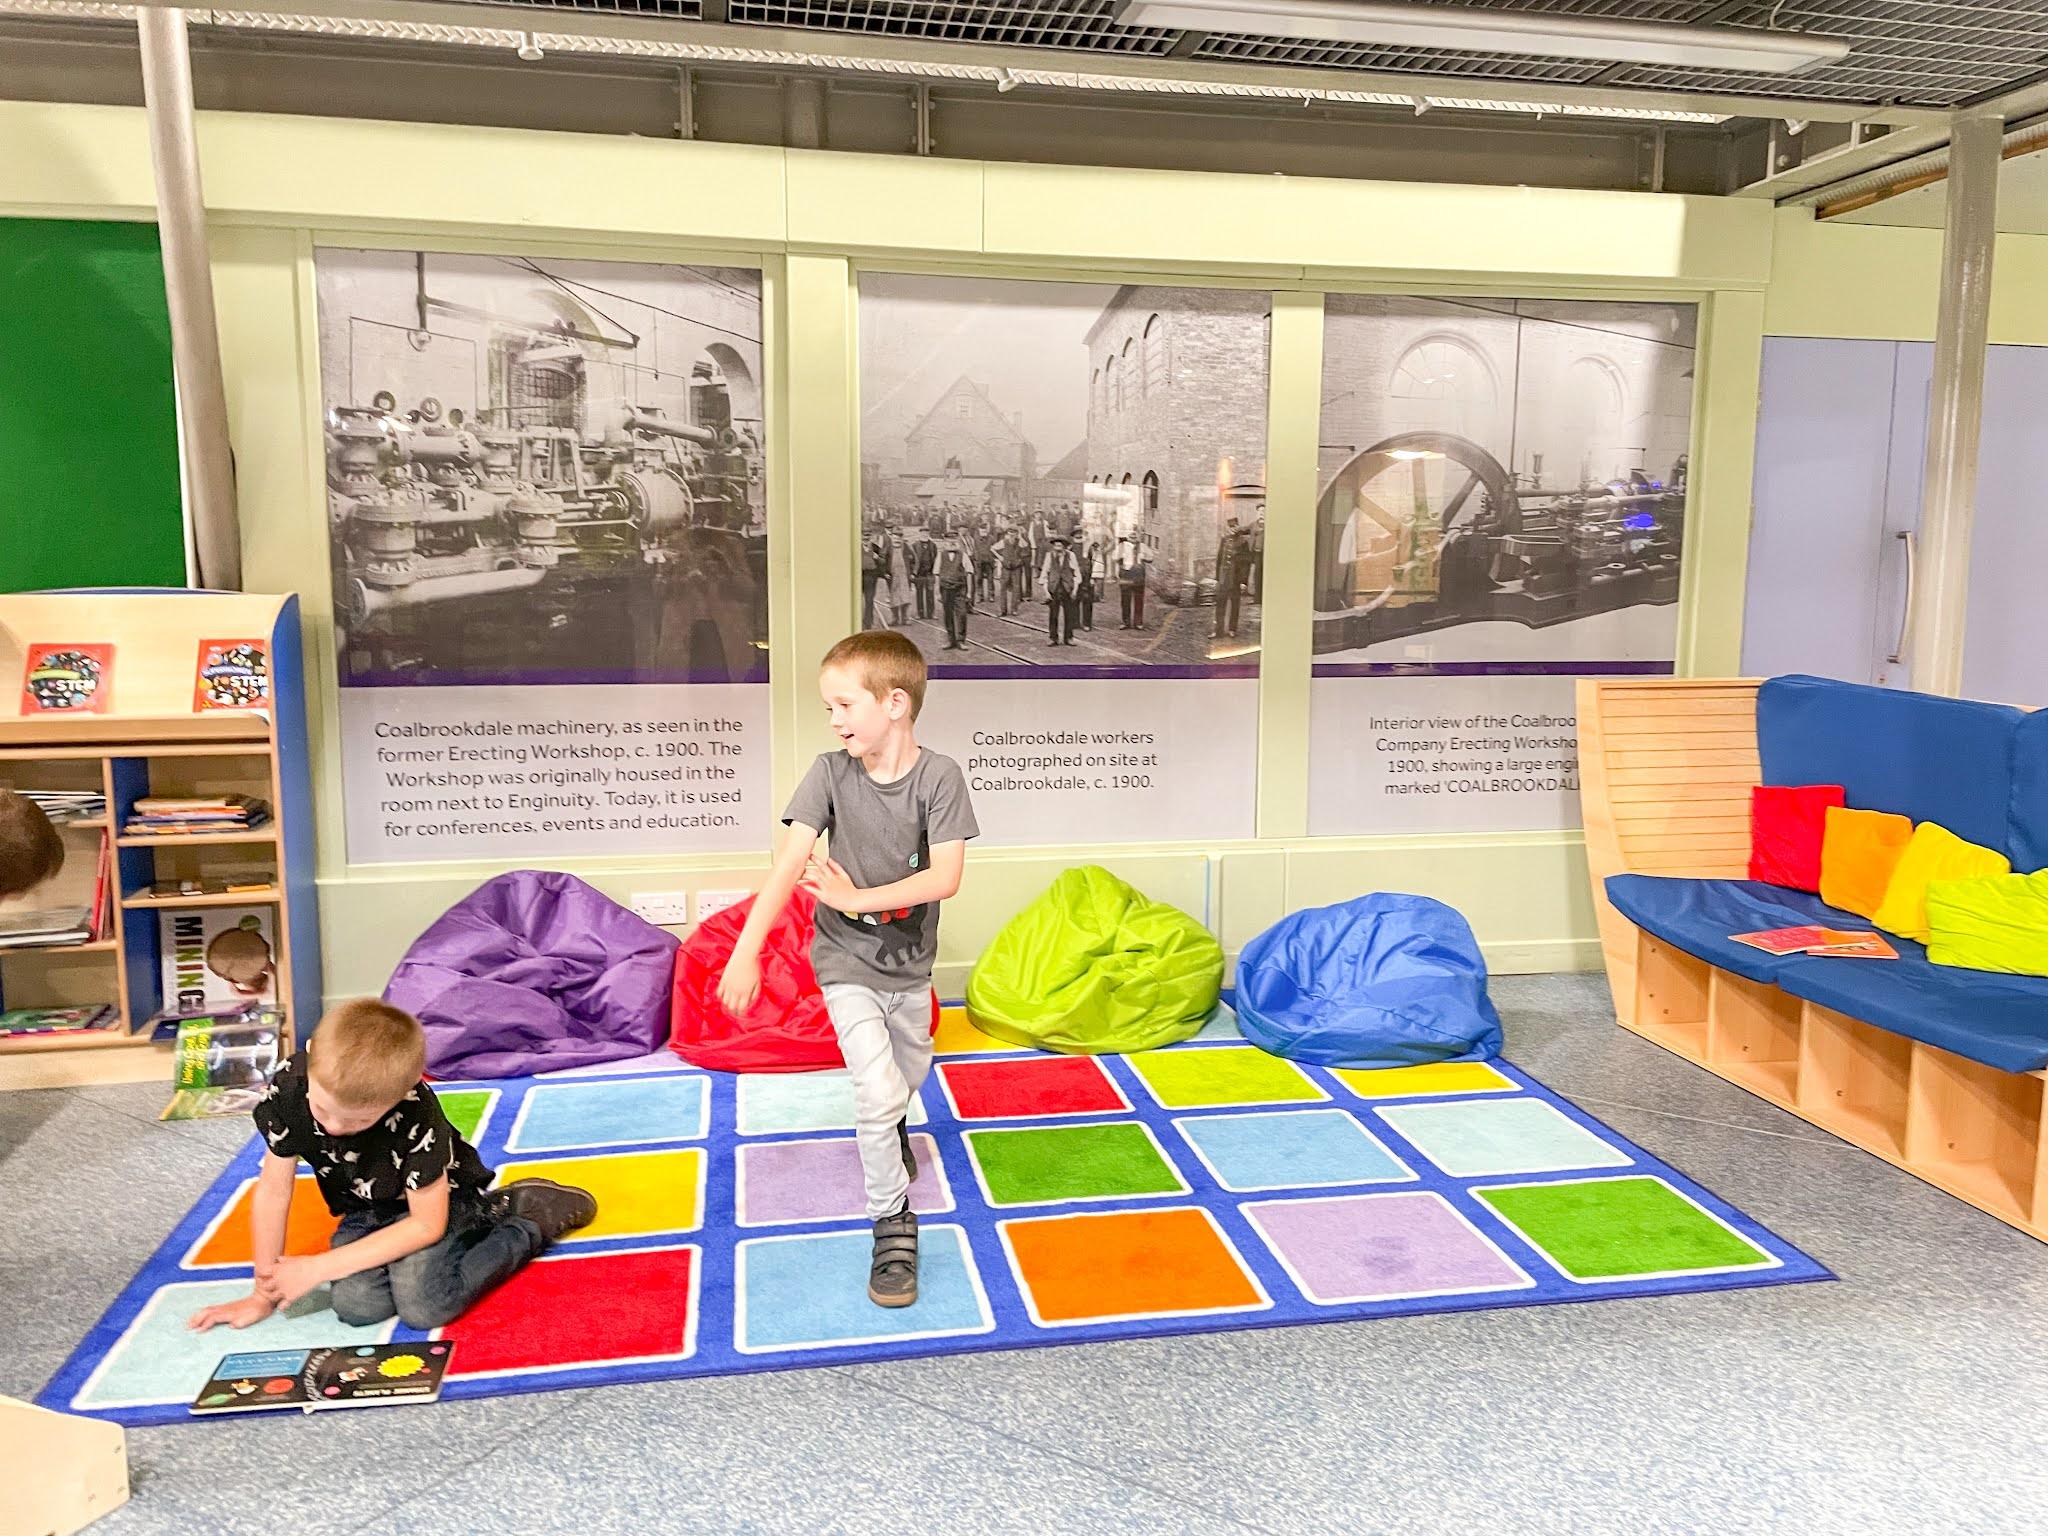 ironbridge telford, enginuity museum